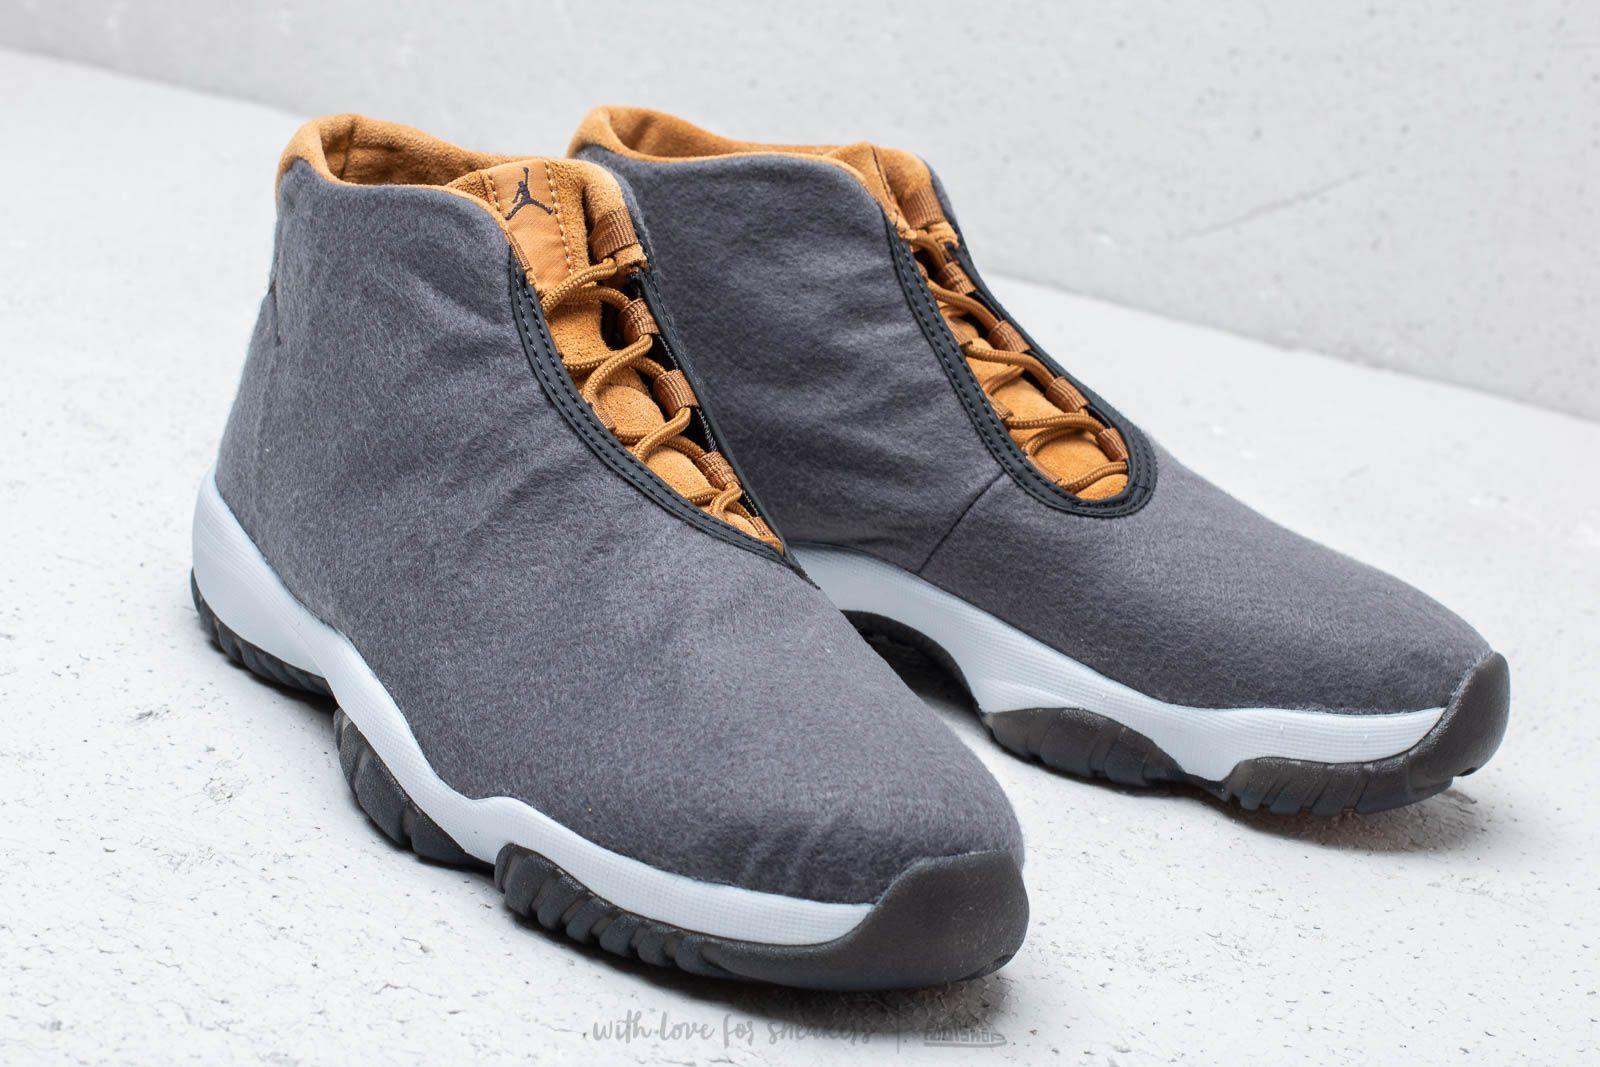 Future Dark Gris Air Bleat Grey Fonce Wheat Jordan J3TlKcF1